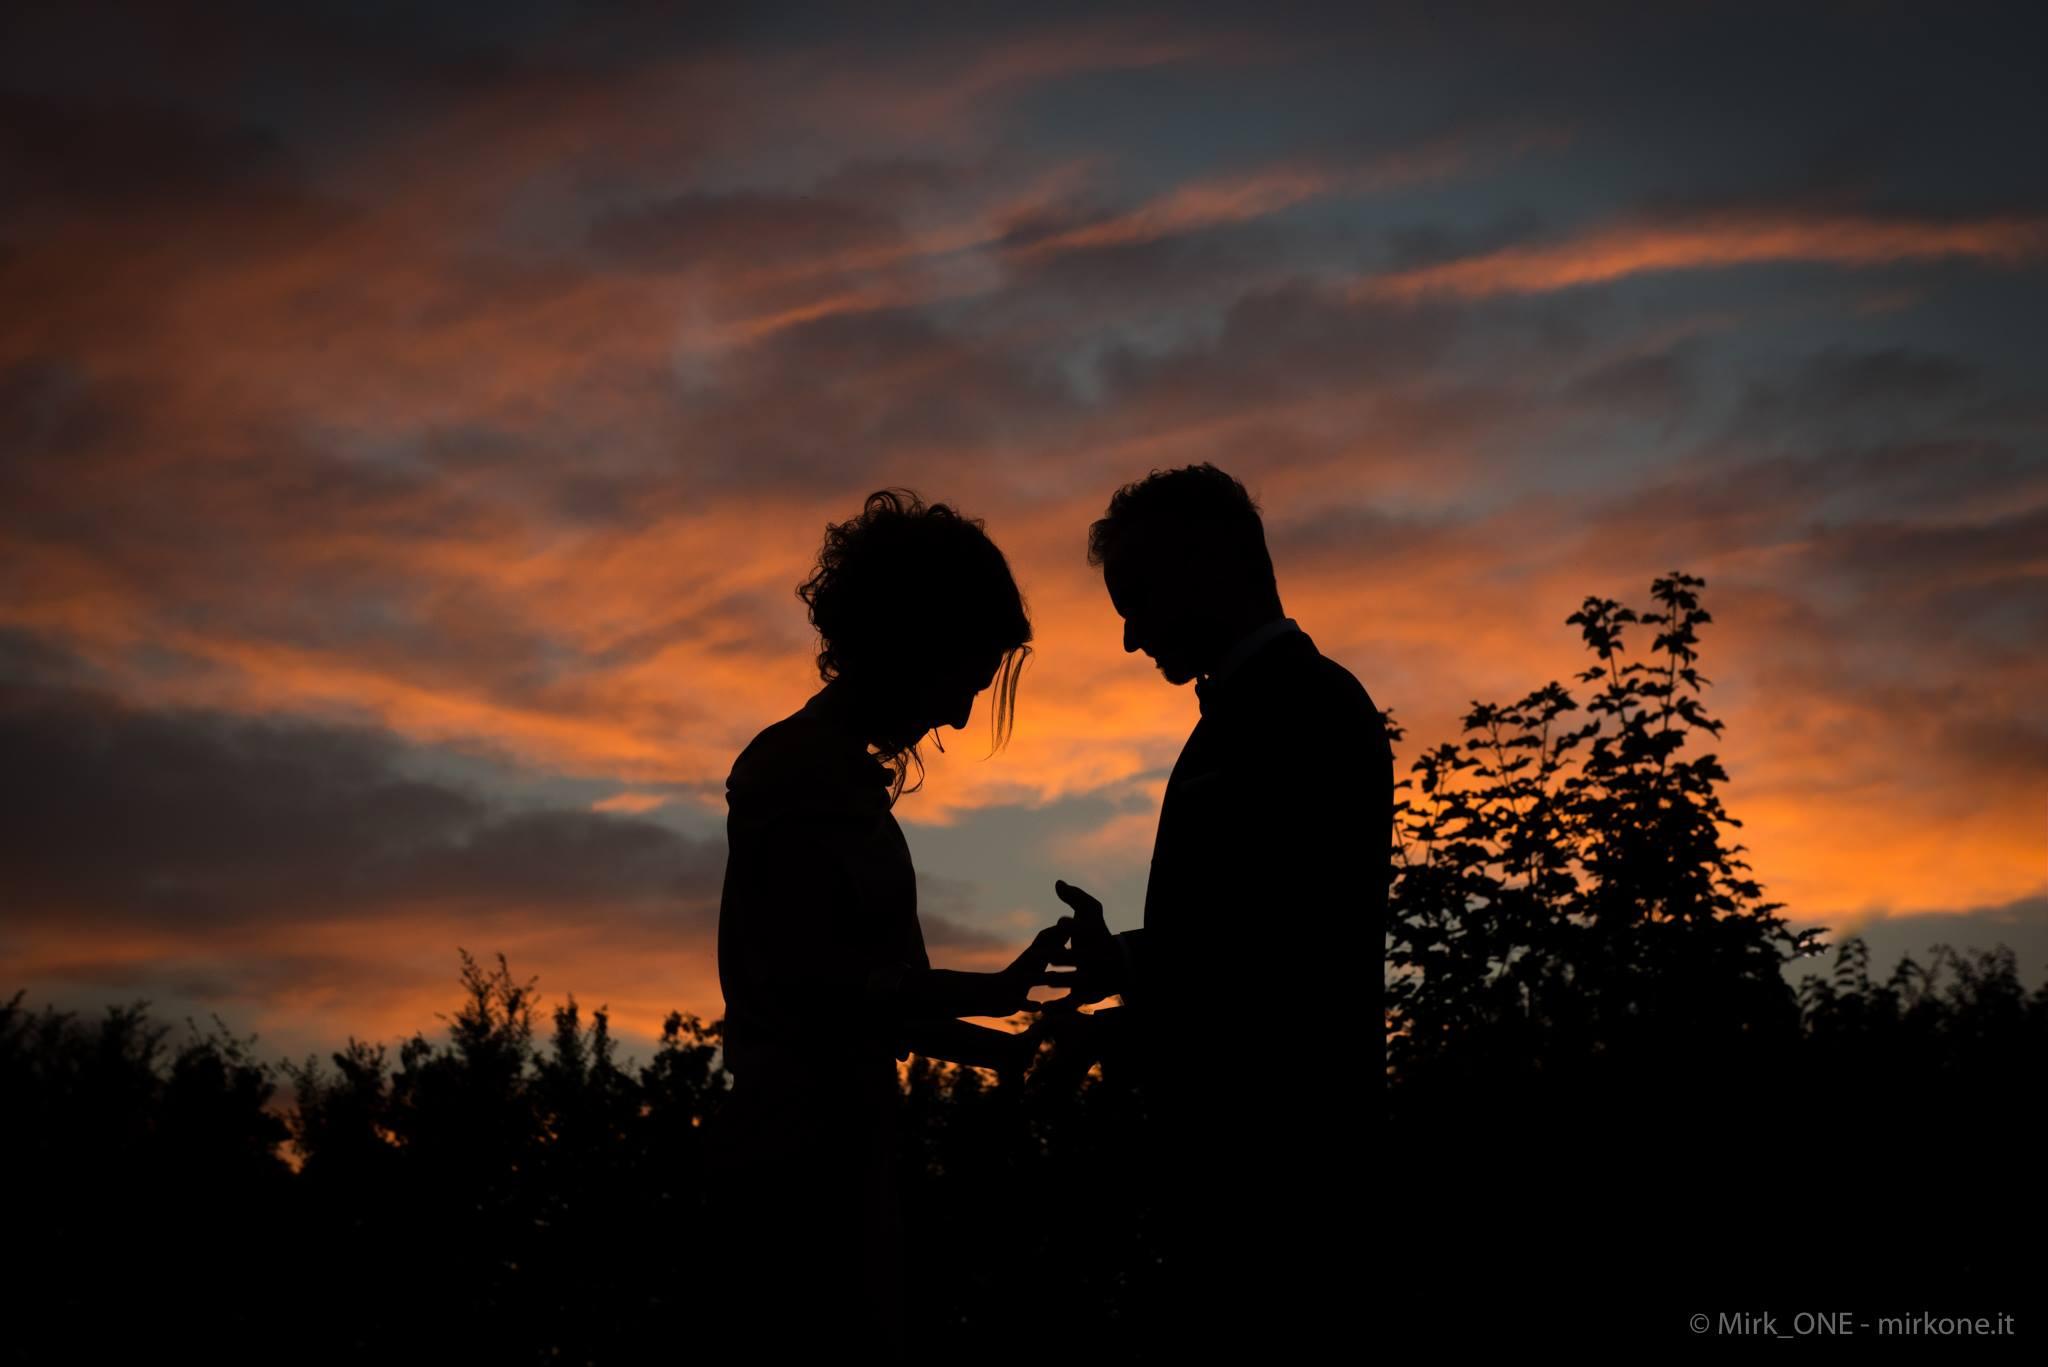 https://lnx.mirkone.it/wp-content/uploads/2015/07/mirk_ONE-fotografo-matrimonio-00103.jpg